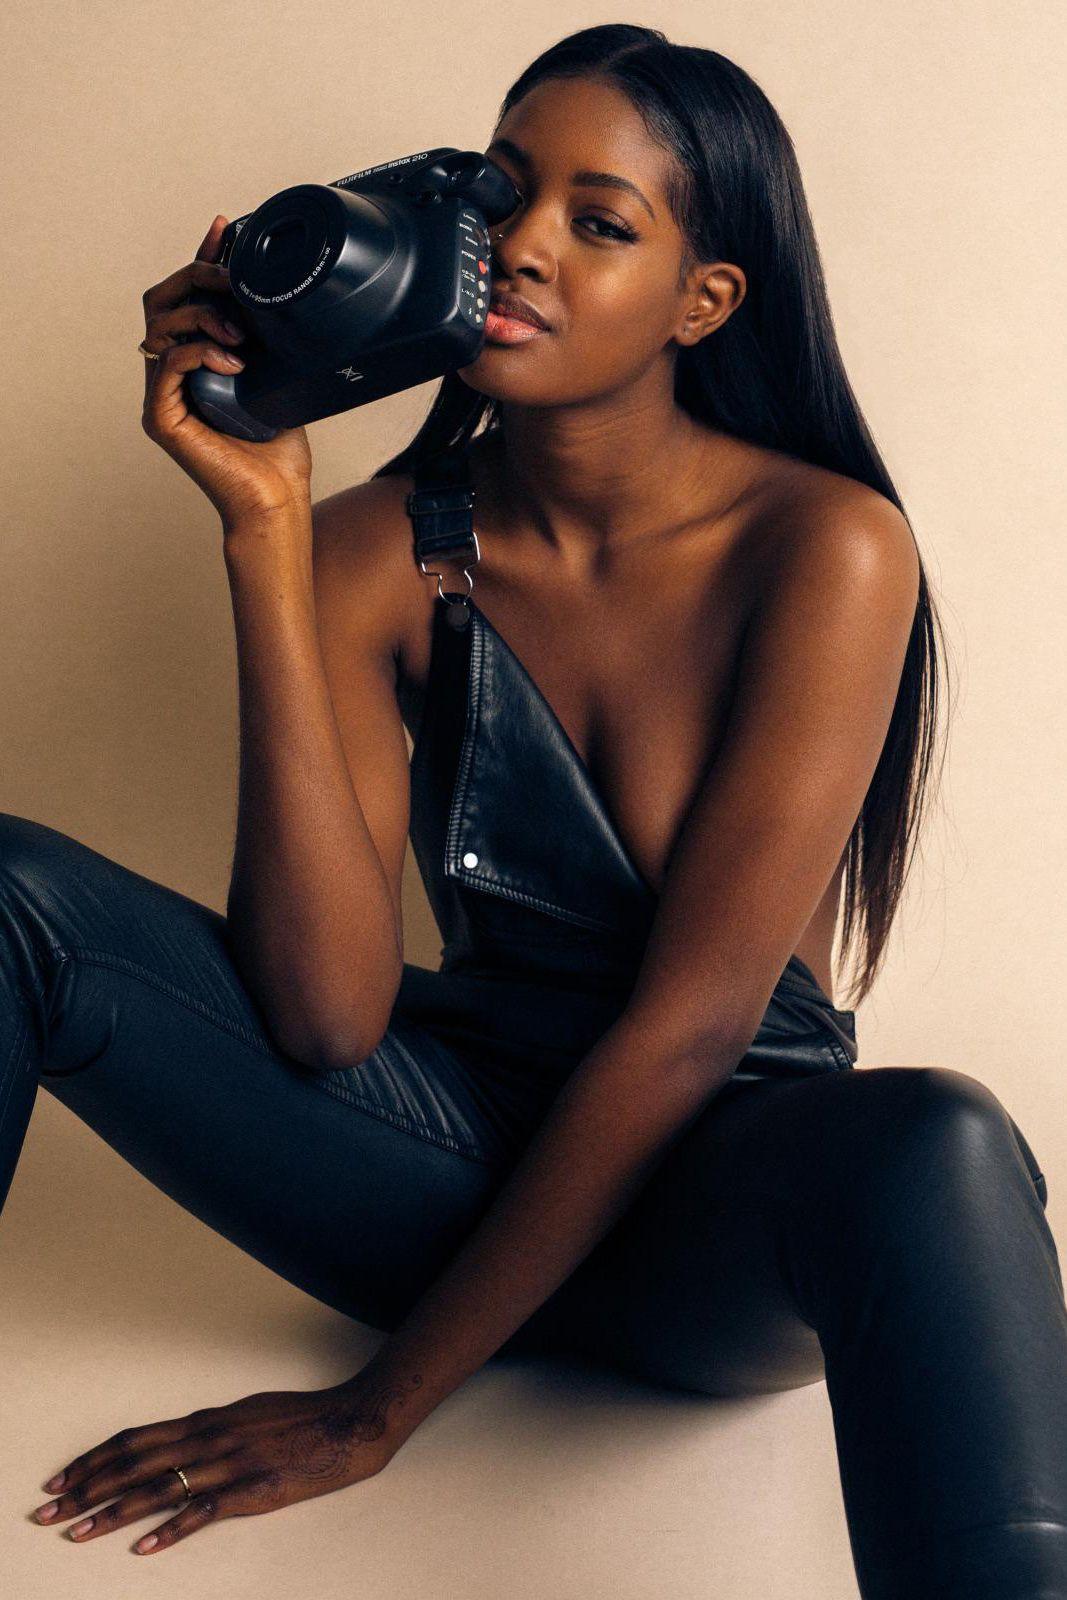 shit-video-models-black